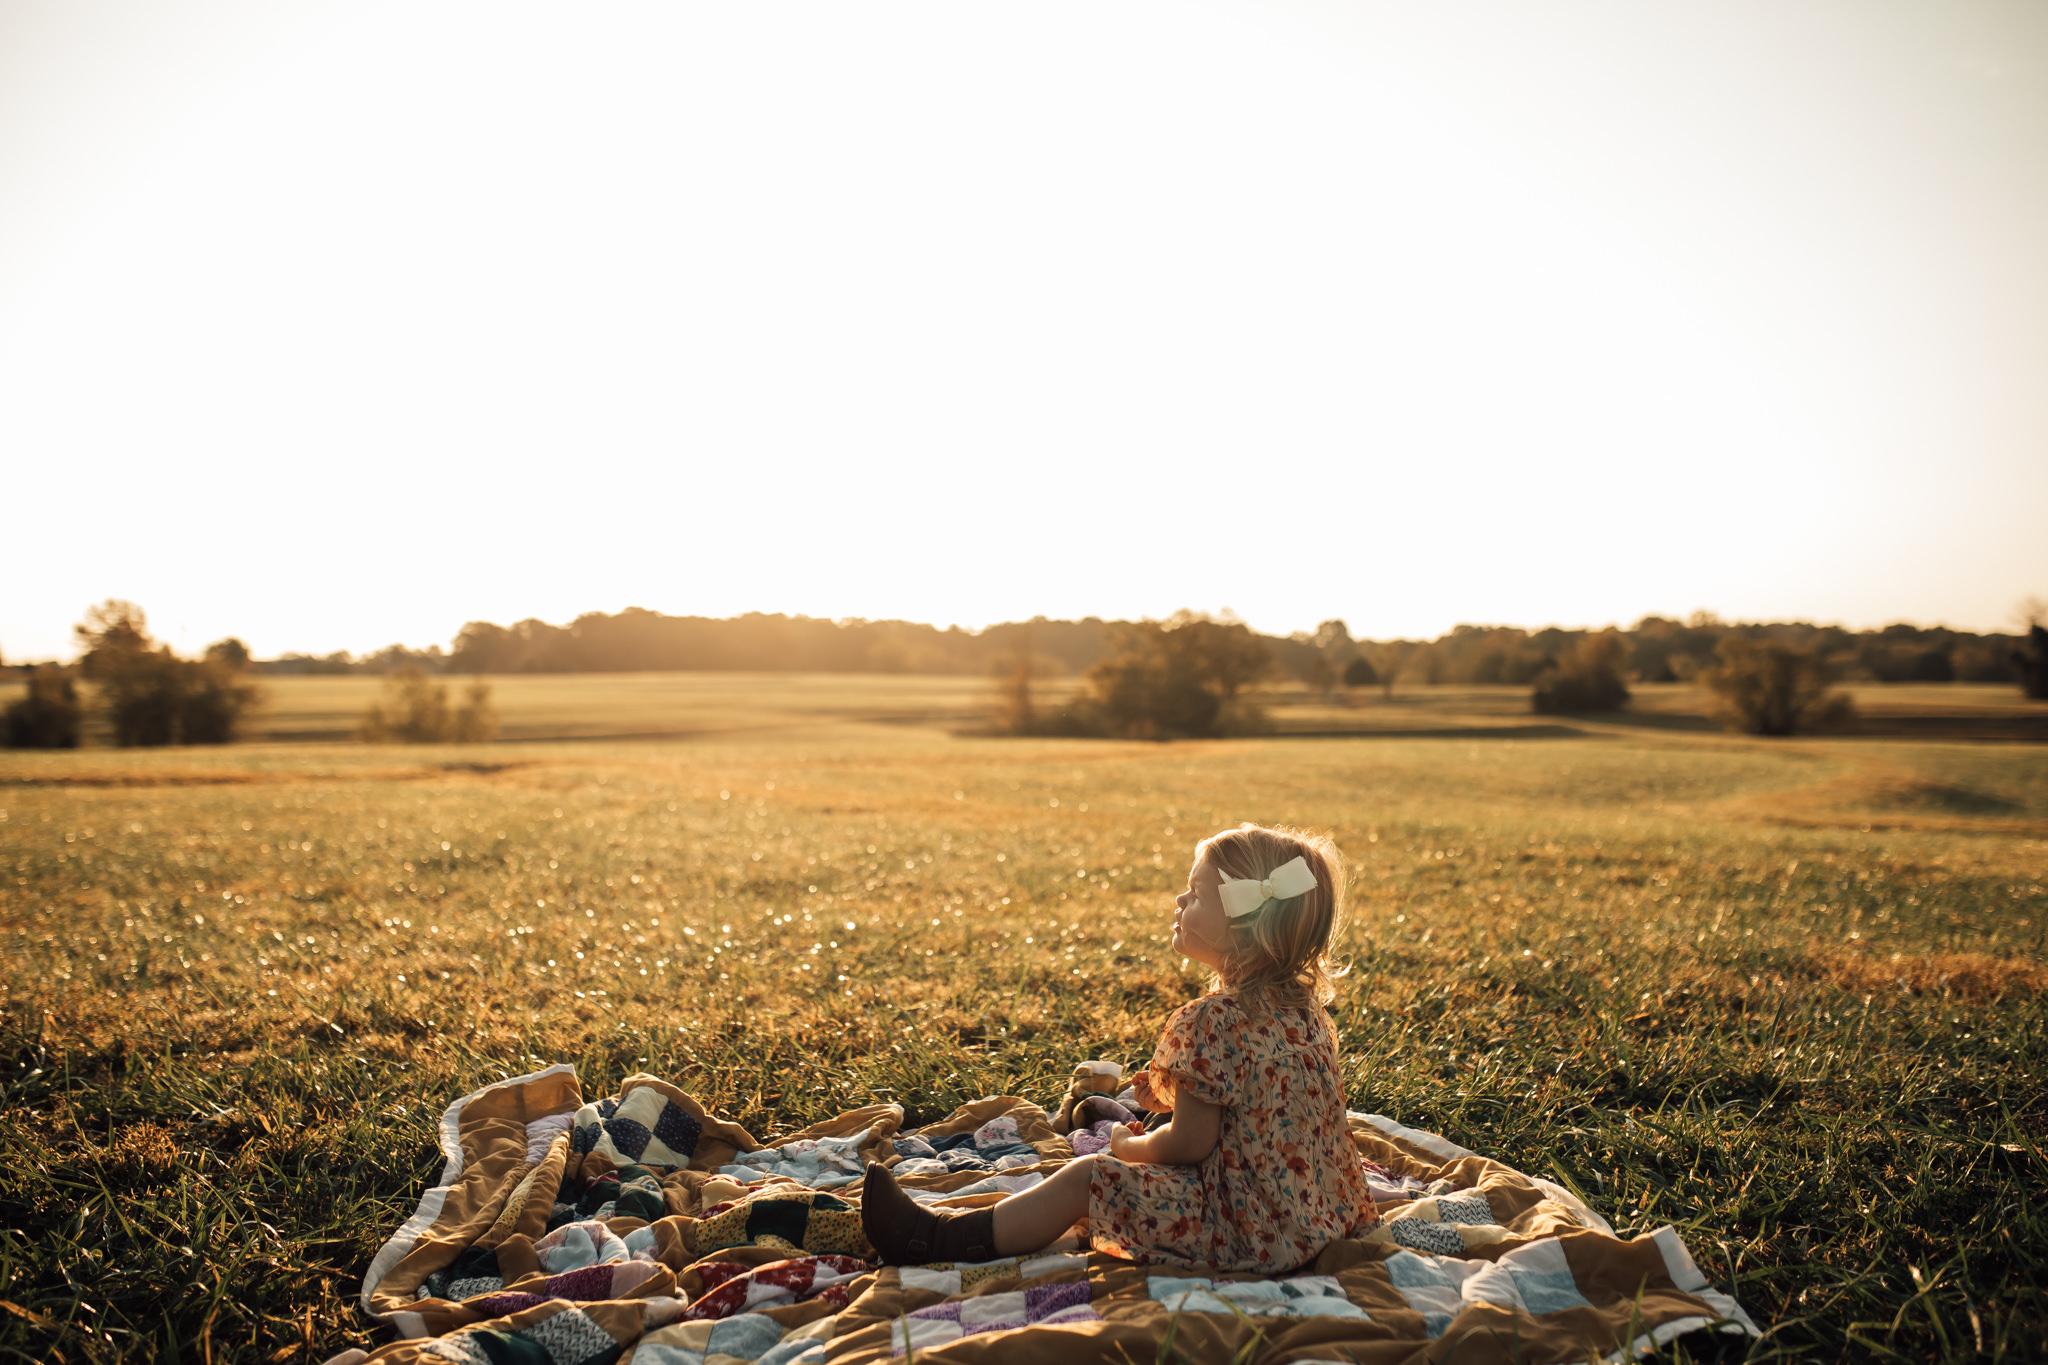 cassie-cook-photography-memphis-family-photographer-lifestyle-family-photographer-sunrise-gray-family-61.jpg